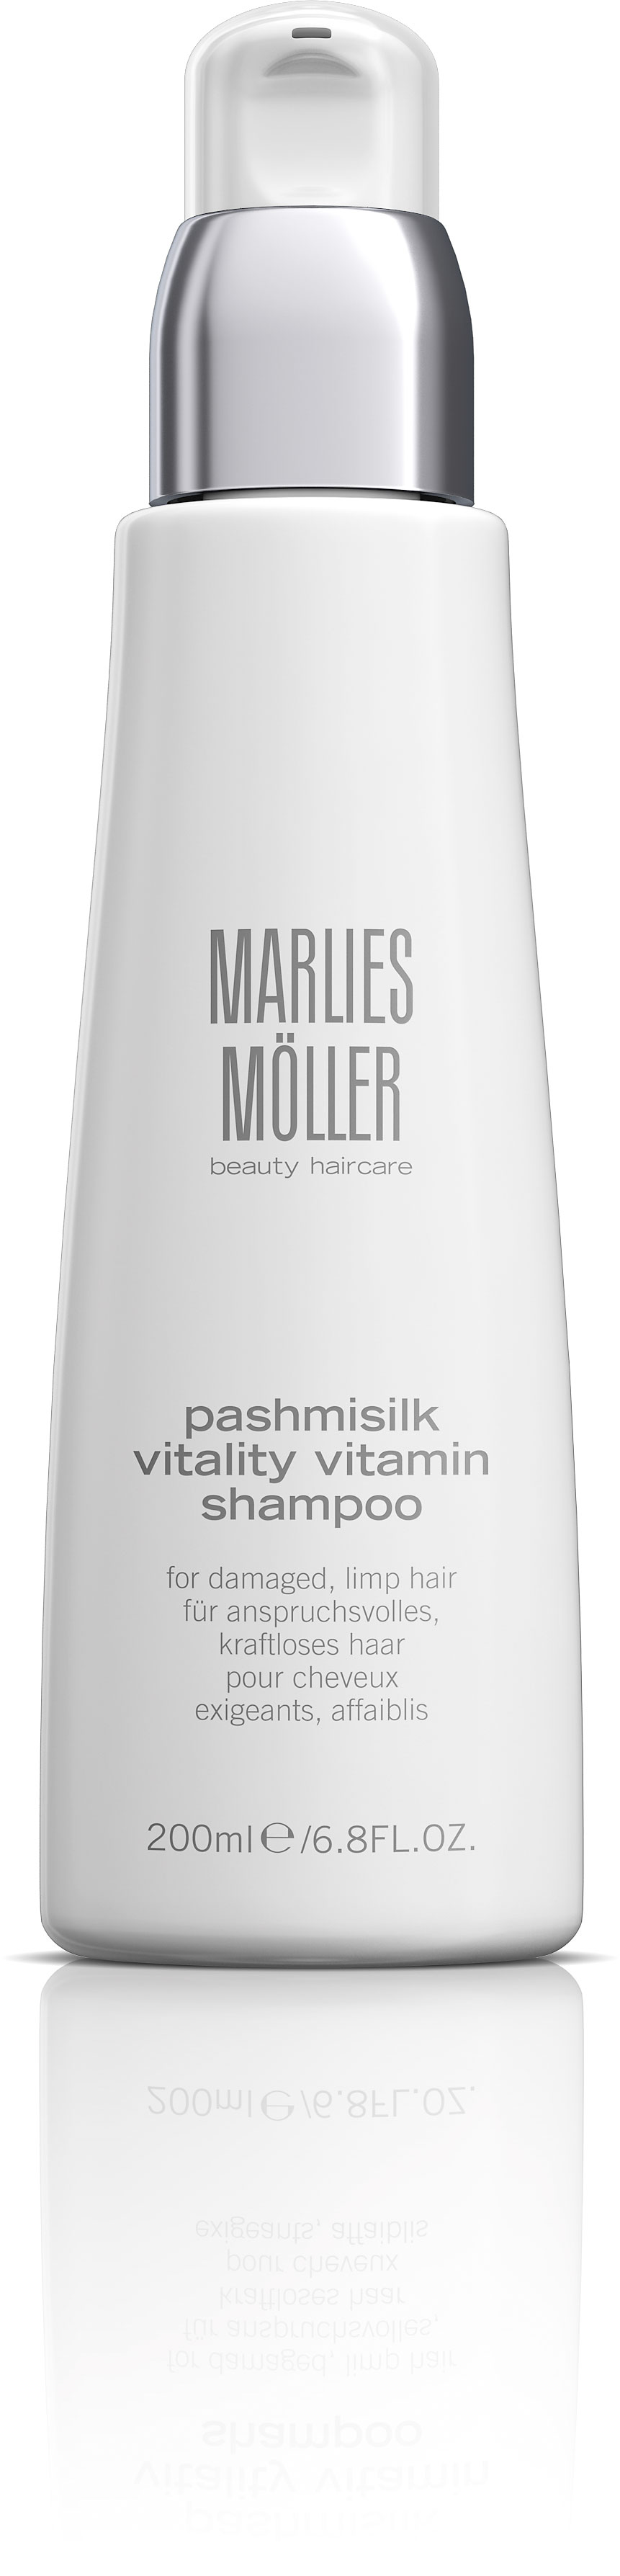 Marlies Möller Pash Silk Del Vit Shamp 200 ml